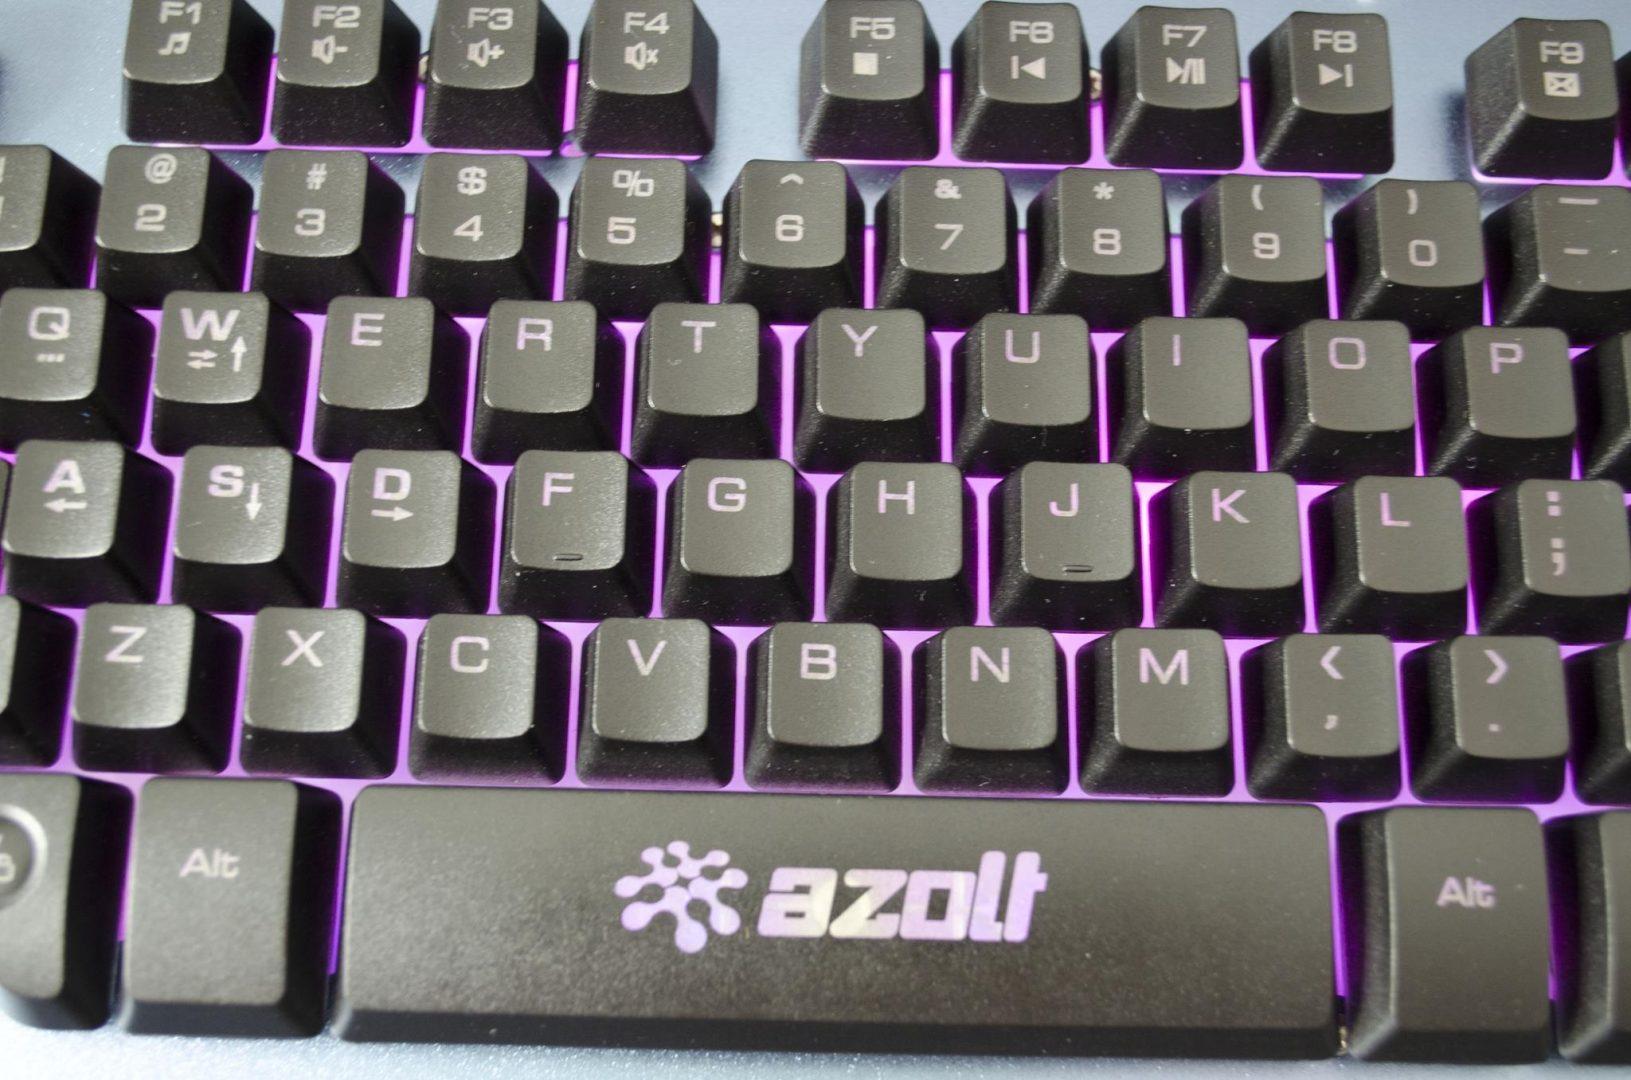 Azolt gCrusayder keyboard review_12